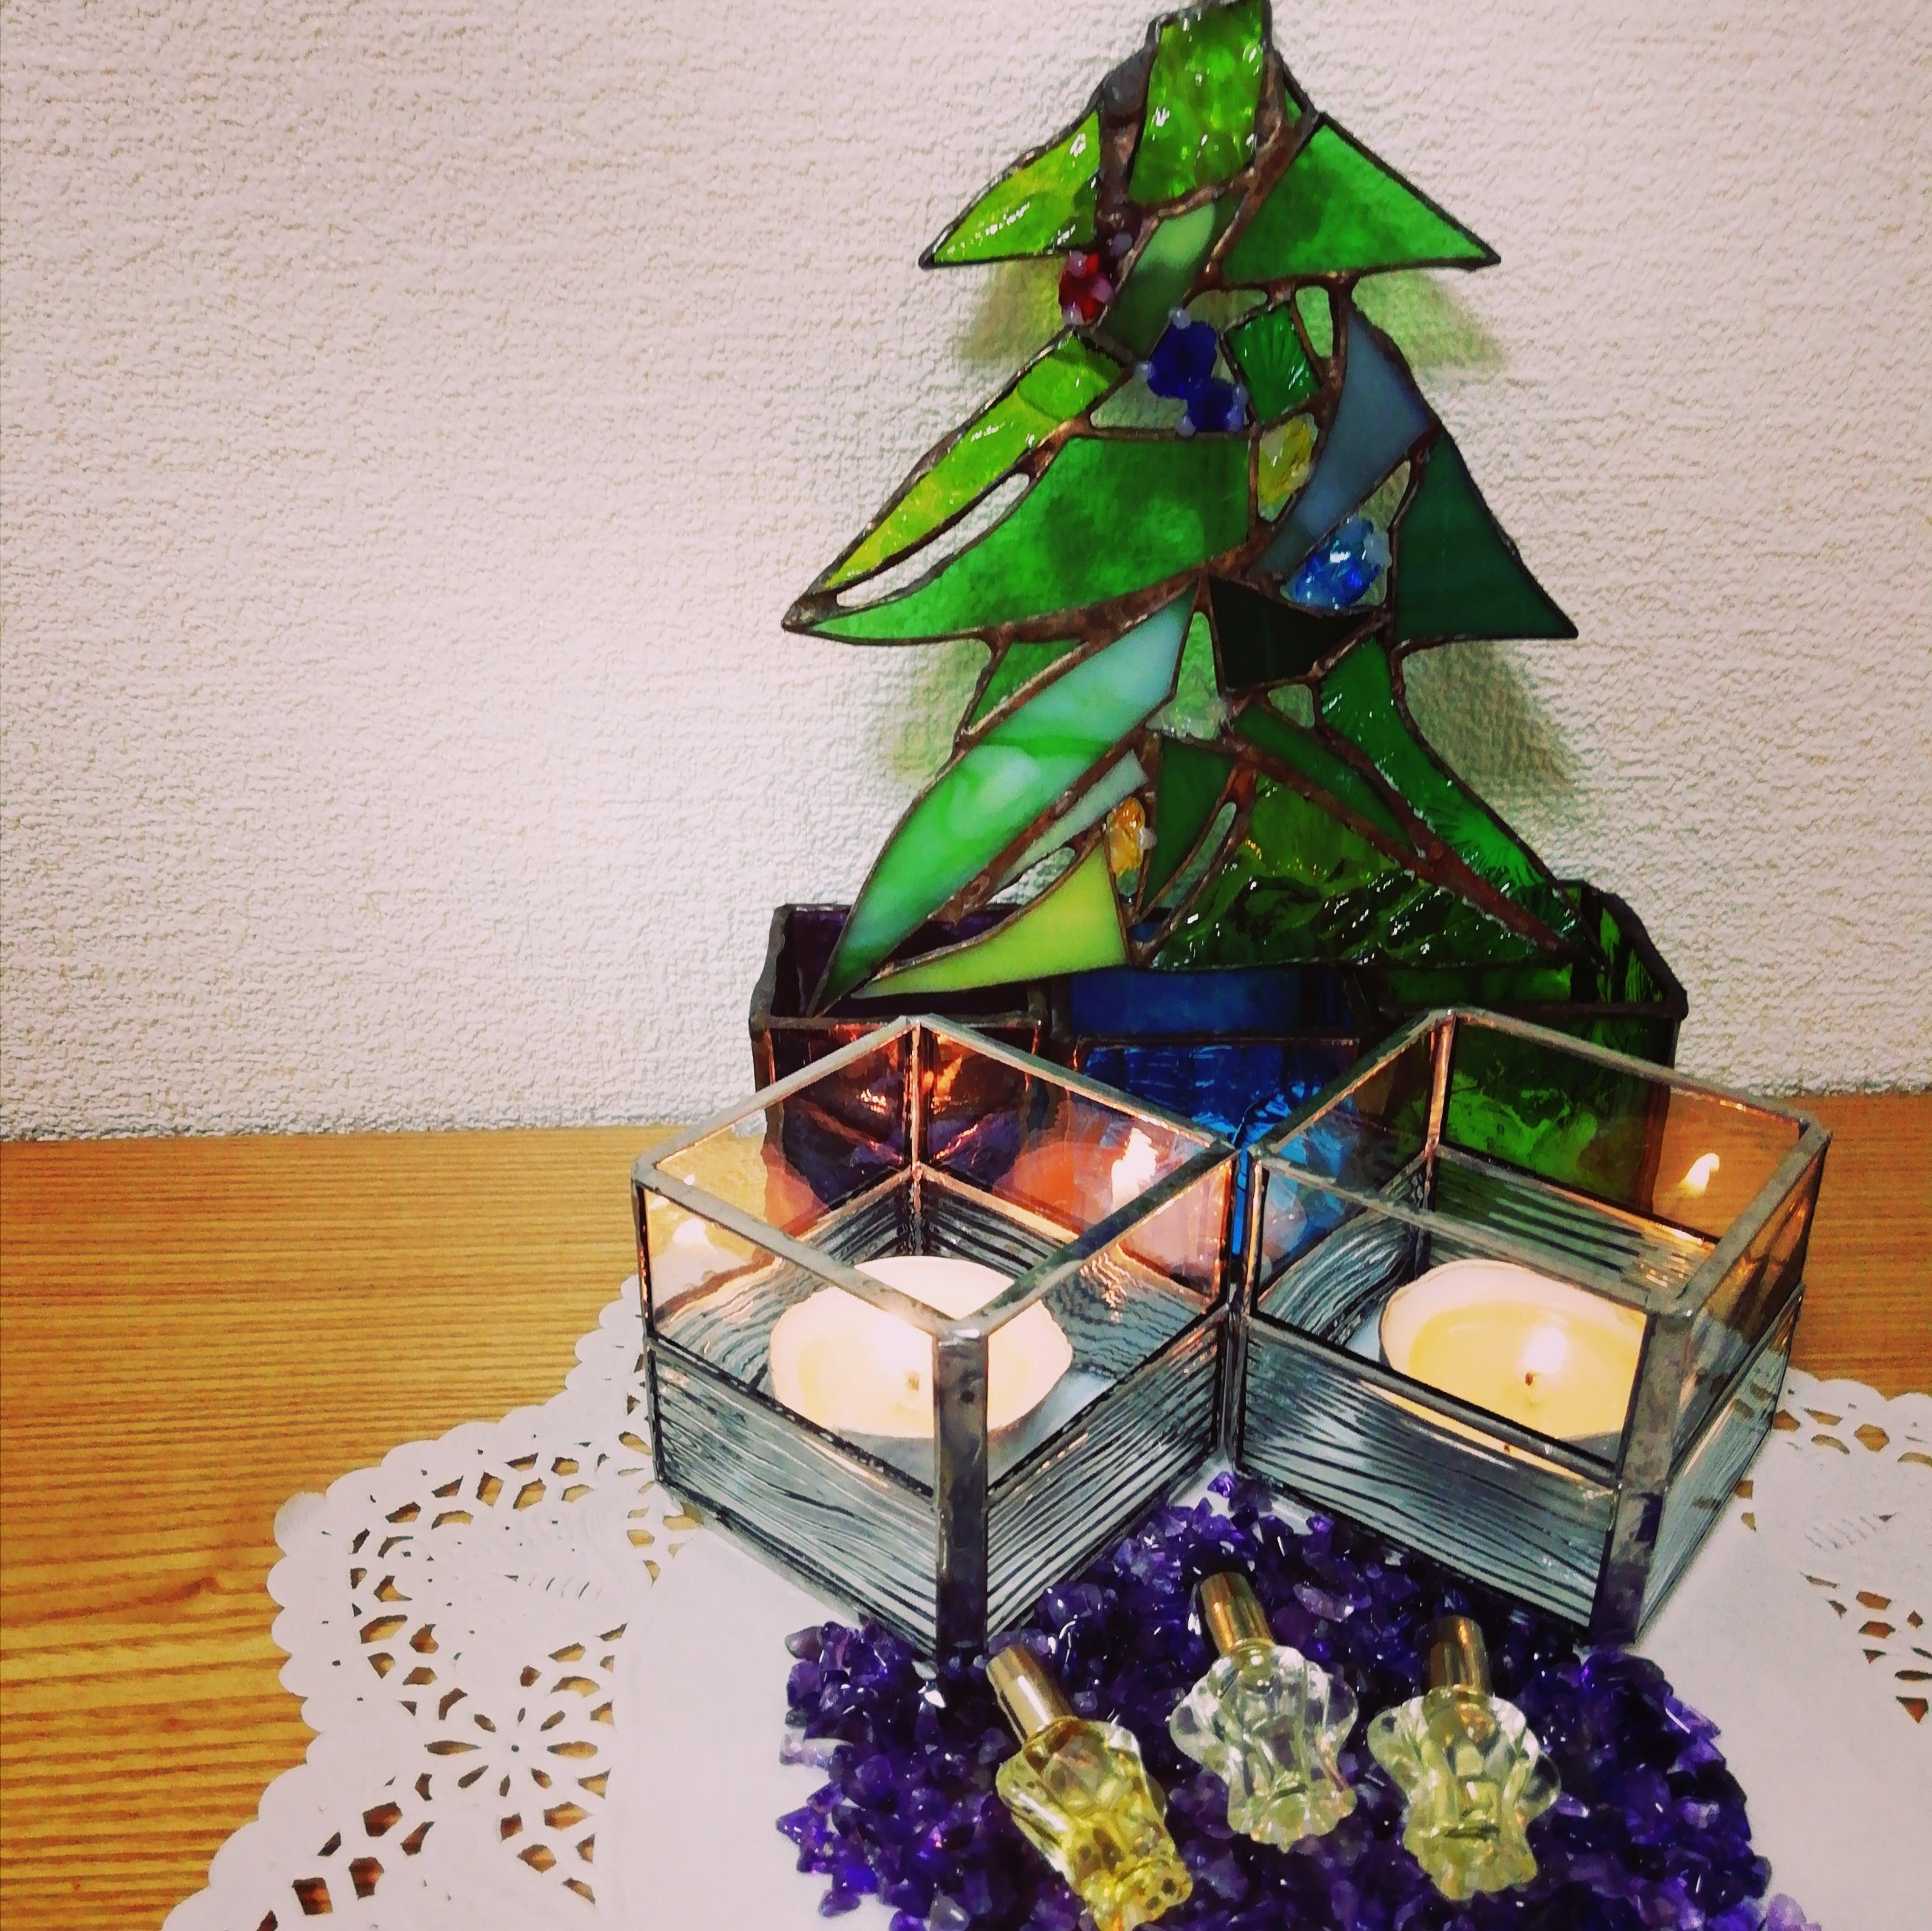 WPlatinum Gift☆クリスマスコフレ☆Limited ランチ付きお話会のイメージその2